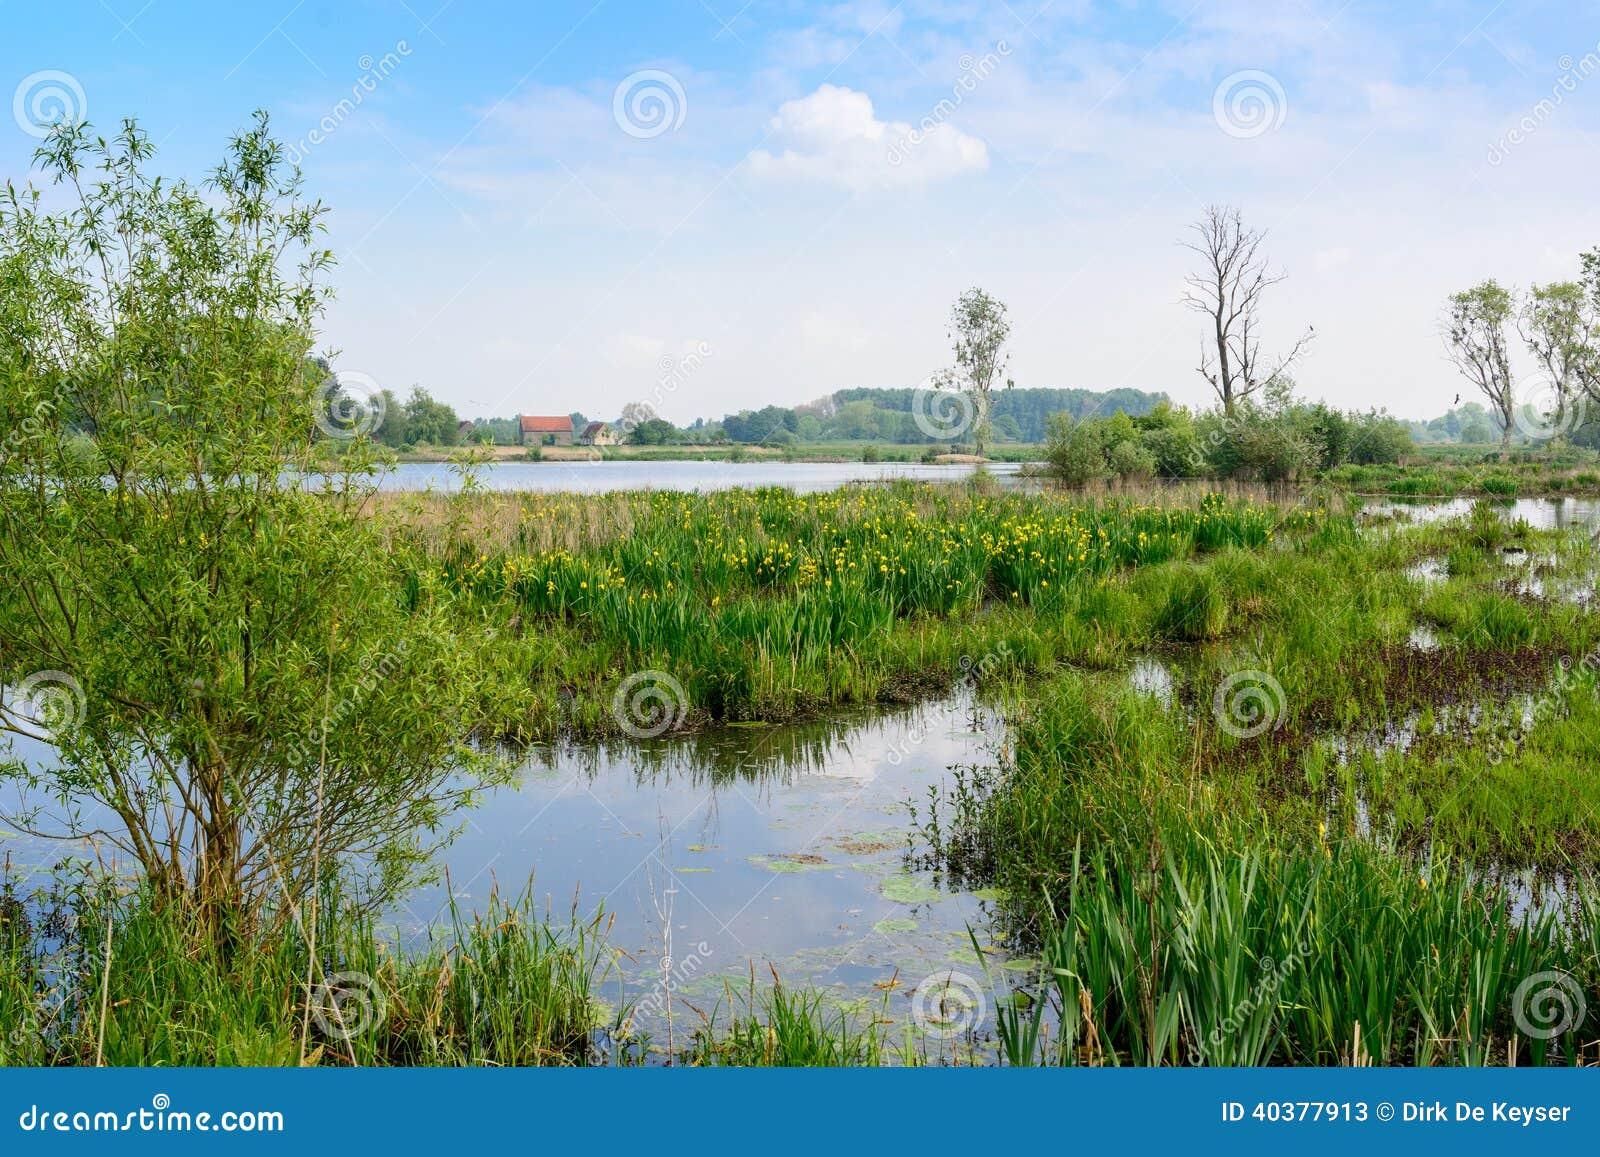 Nature reserve Bourgoyen in Ghent, Belgium